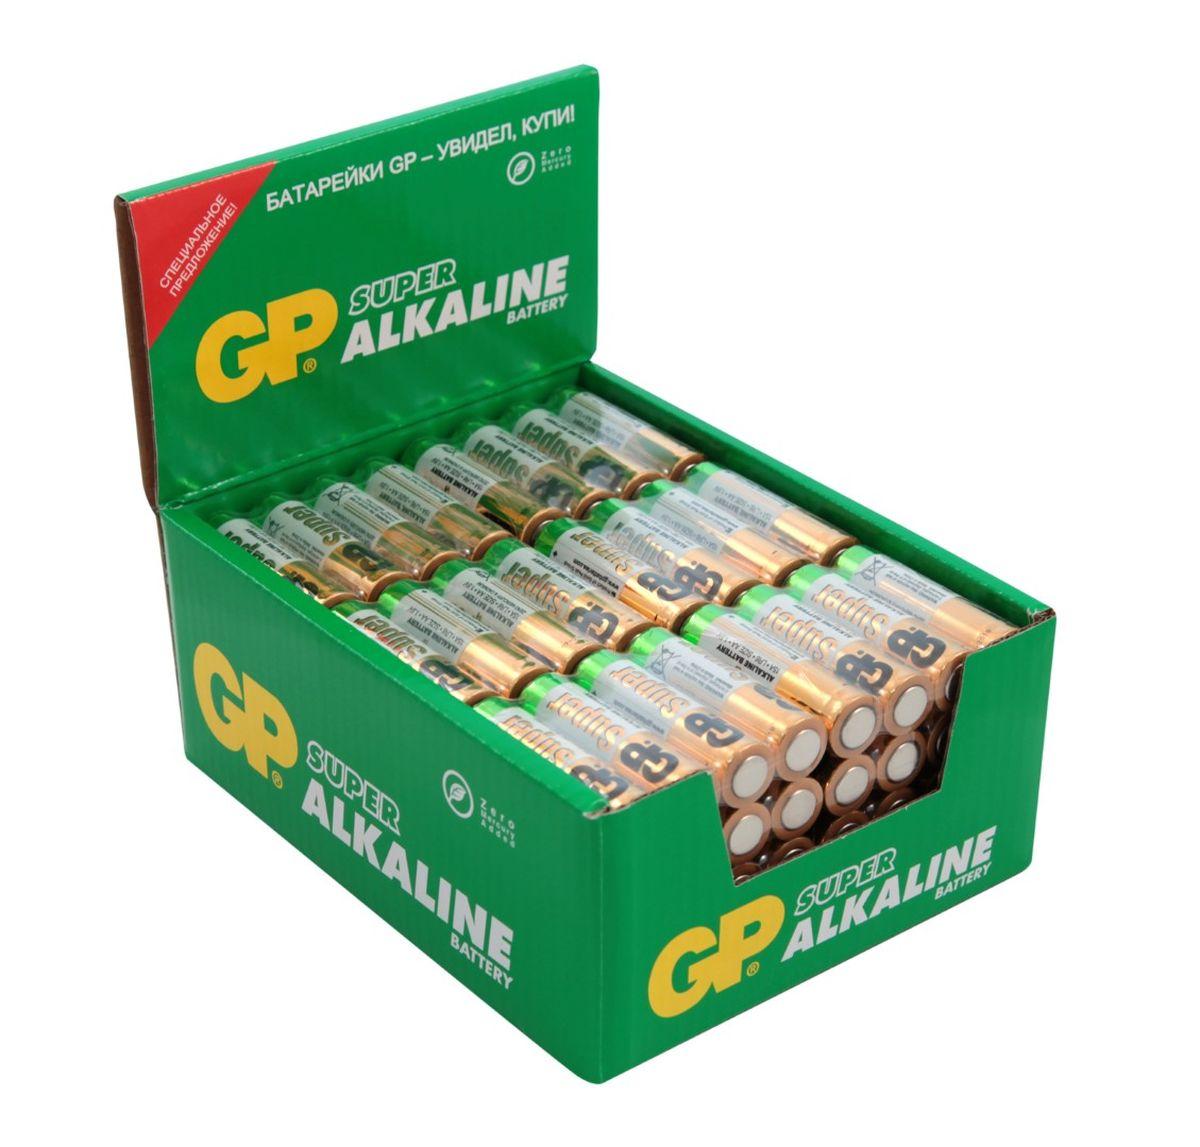 Батарейка алкалиновая GP Batteries Super Alkaline, тип АА, 96 шт батарейка алкалиновая gp batteries super alkaline тип крона 9v